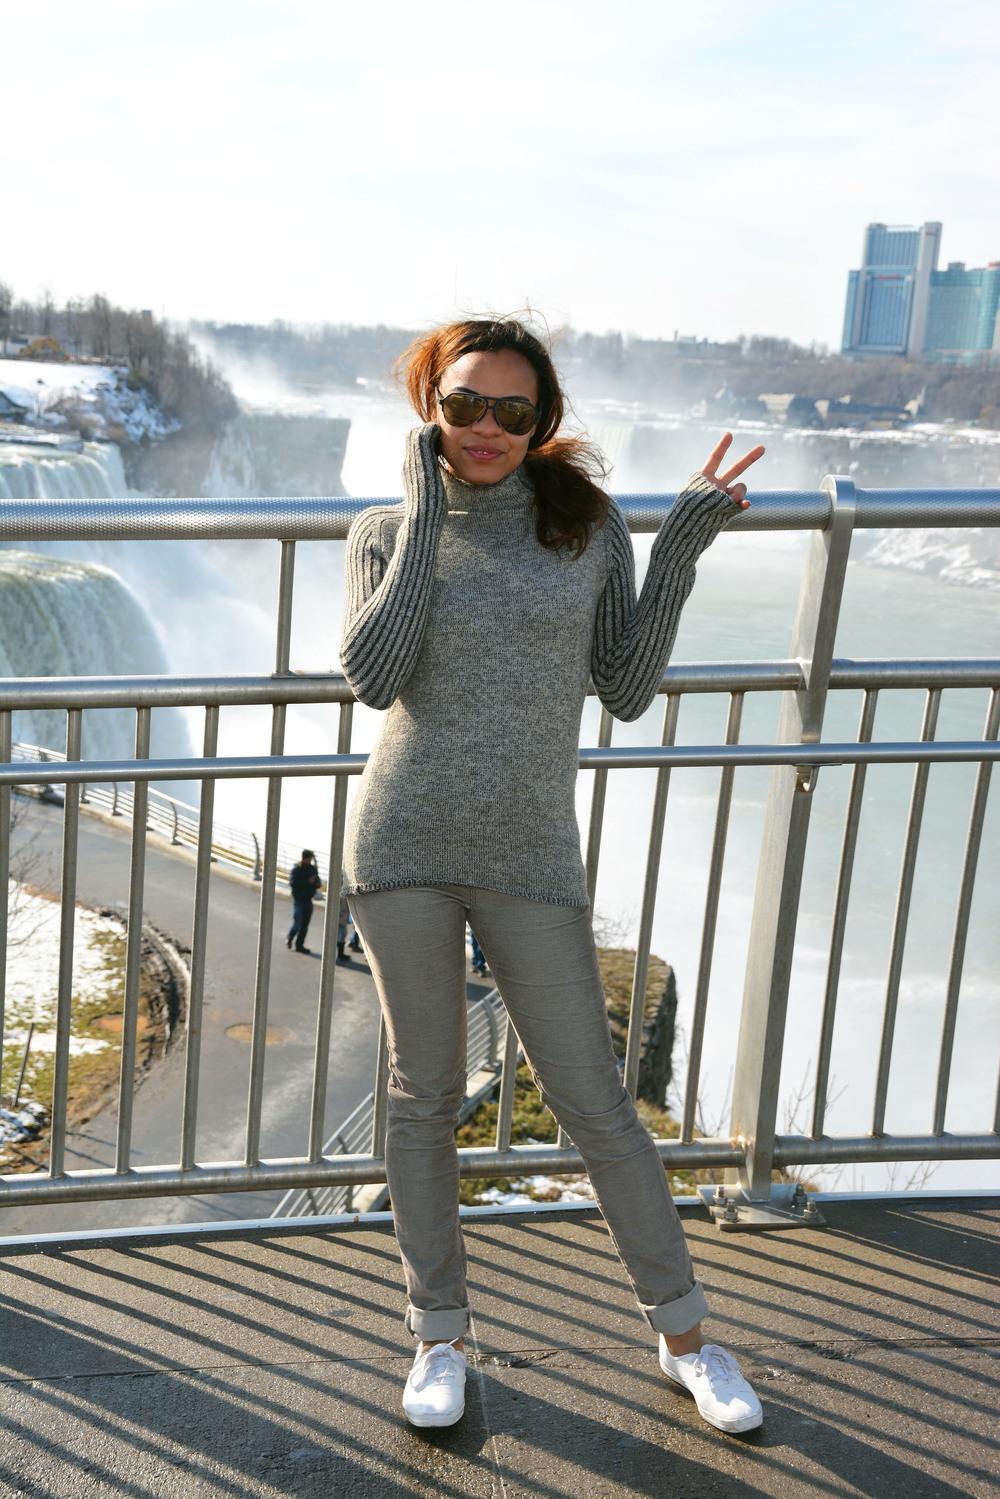 wearing: BDG corduroy pants, Ked's shoes, Zara turtleneck knit, Dolce & Gabbana sunnies.